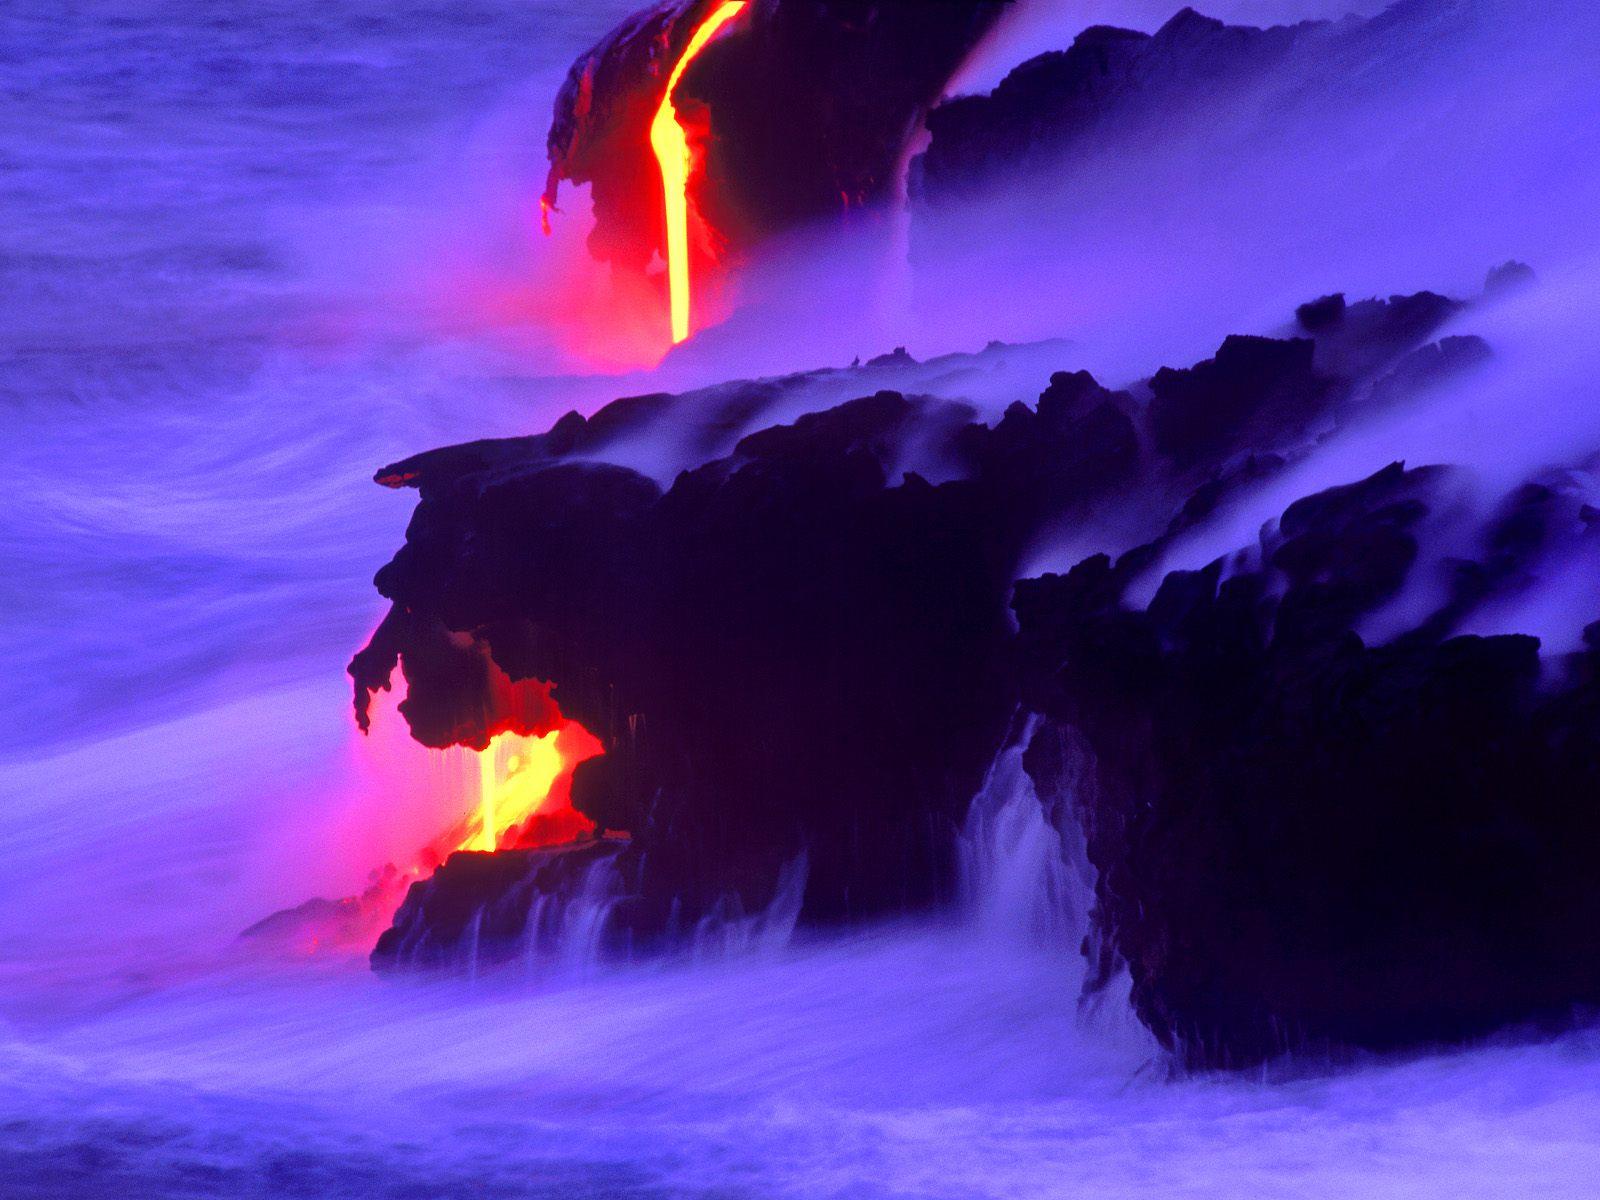 Falling Cherry Blossom Wallpaper Hd Hawaii Images Lava Dreams Big Island Hd Wallpaper And